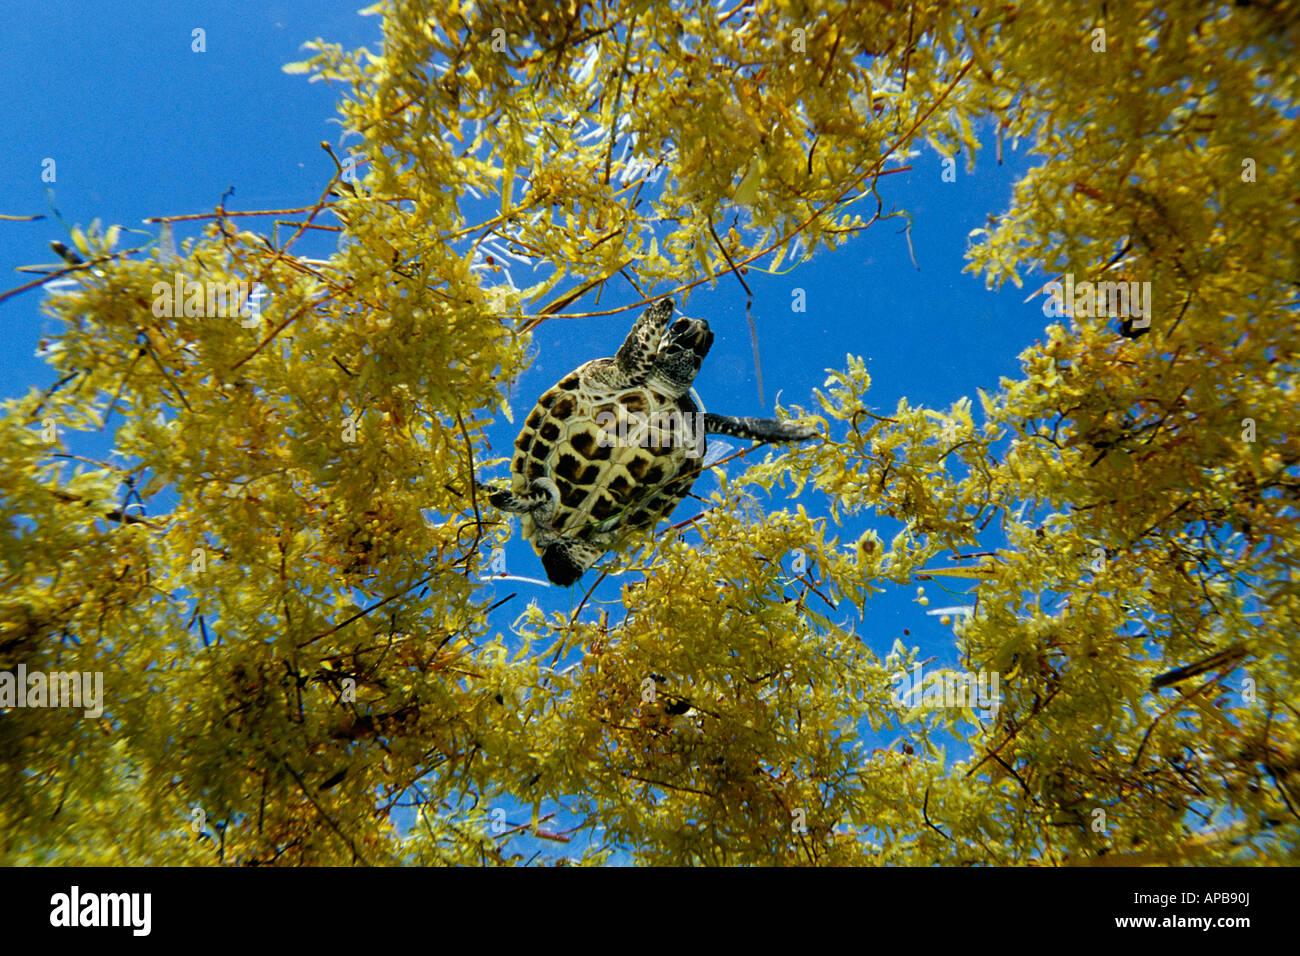 Hawksbill turtle in sargassum weed Eretmochelys imbricata Florida Atlantic Ocean - Stock Image